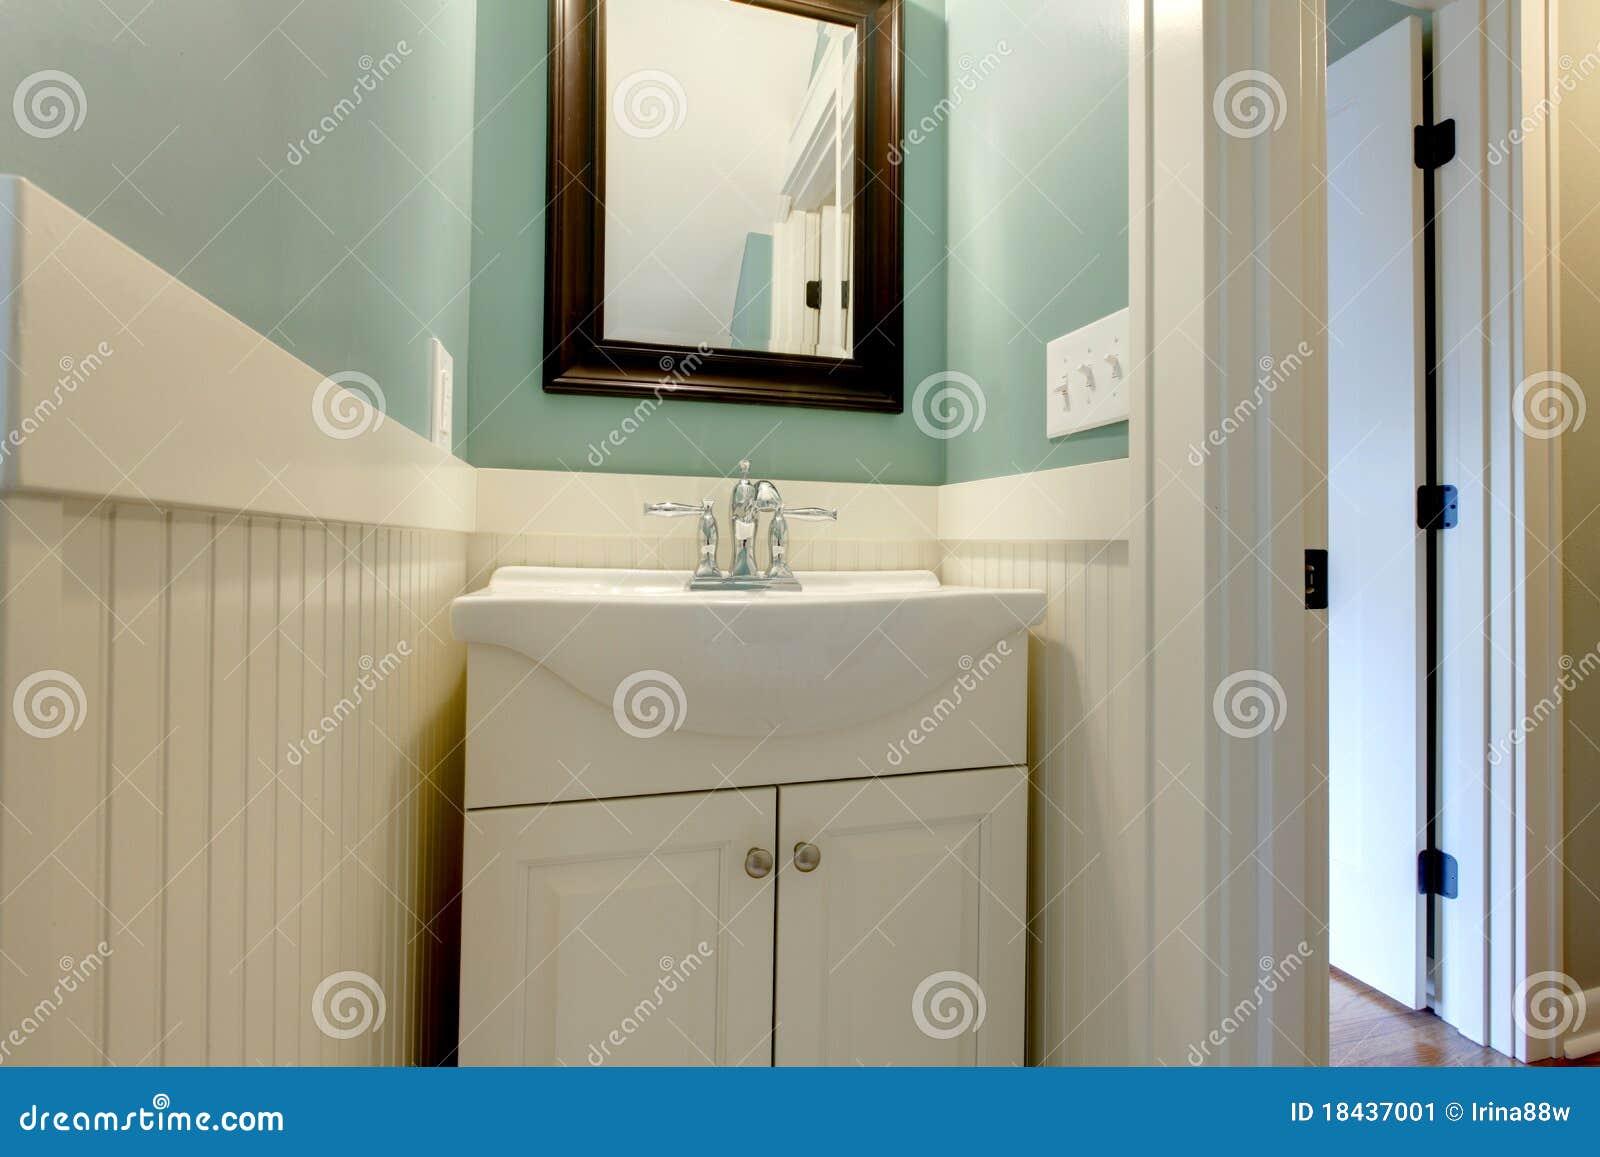 Luxury fresh green blue white bathroom sink stock image for Bathroom remodeling tacoma wa